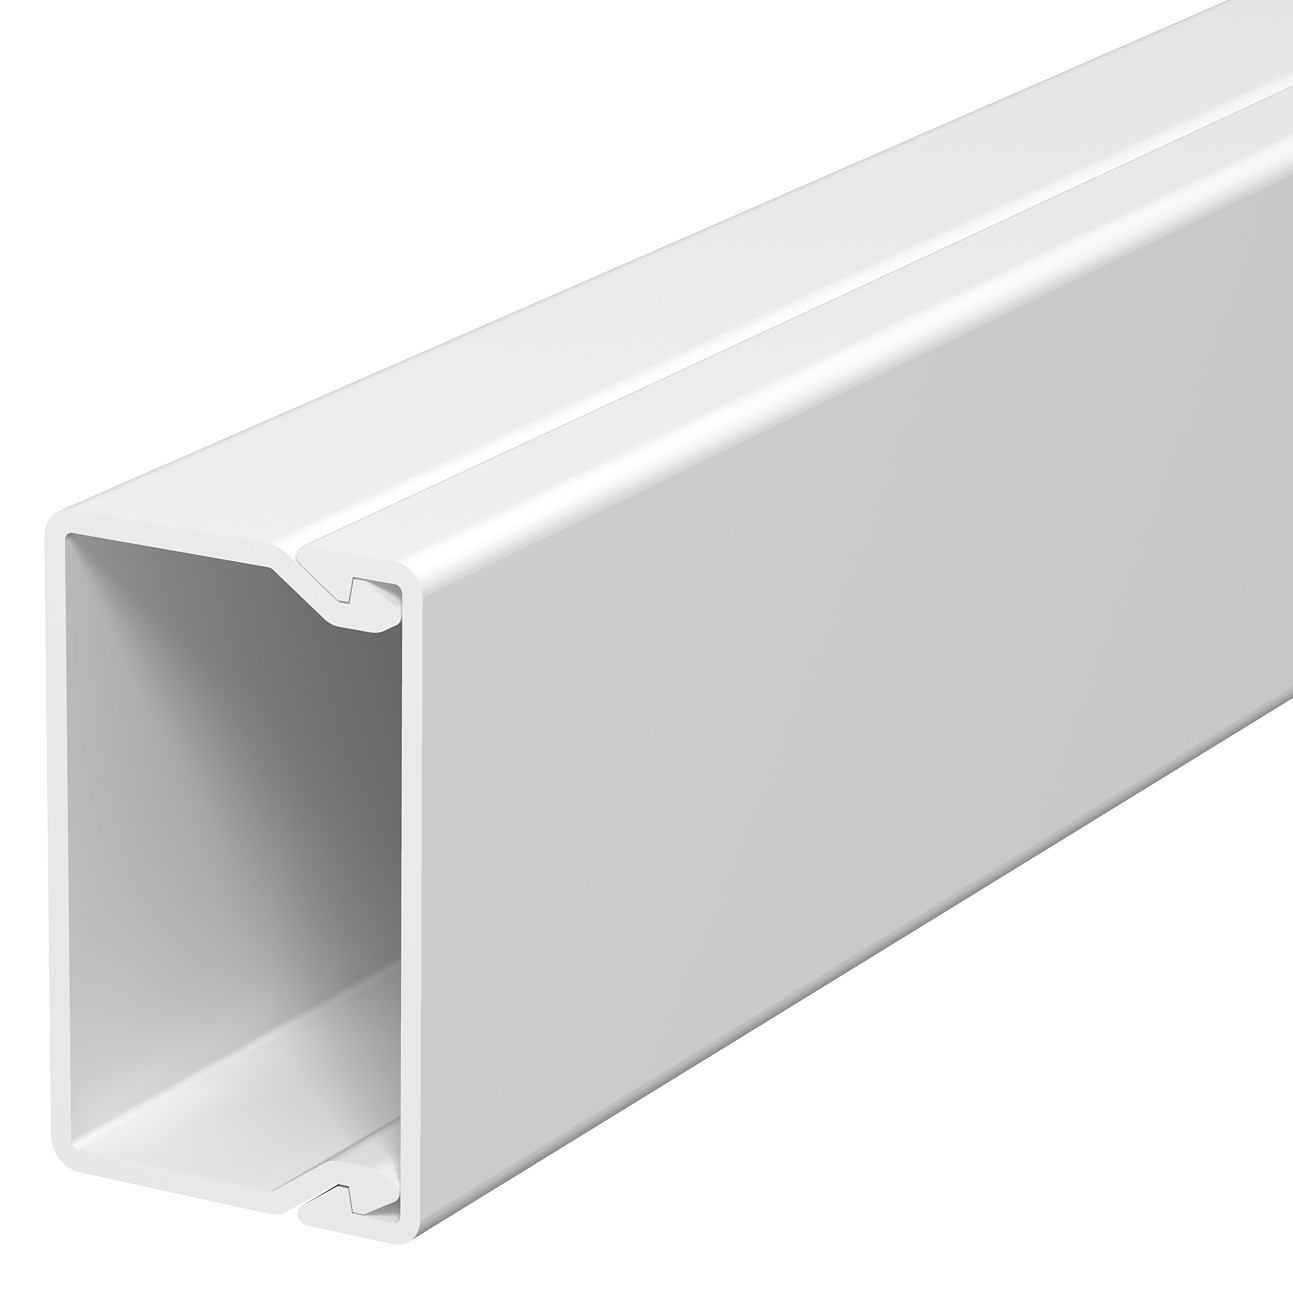 Canal WDK 6191061, 25 x 40 mm, cu capac, alb, PVC